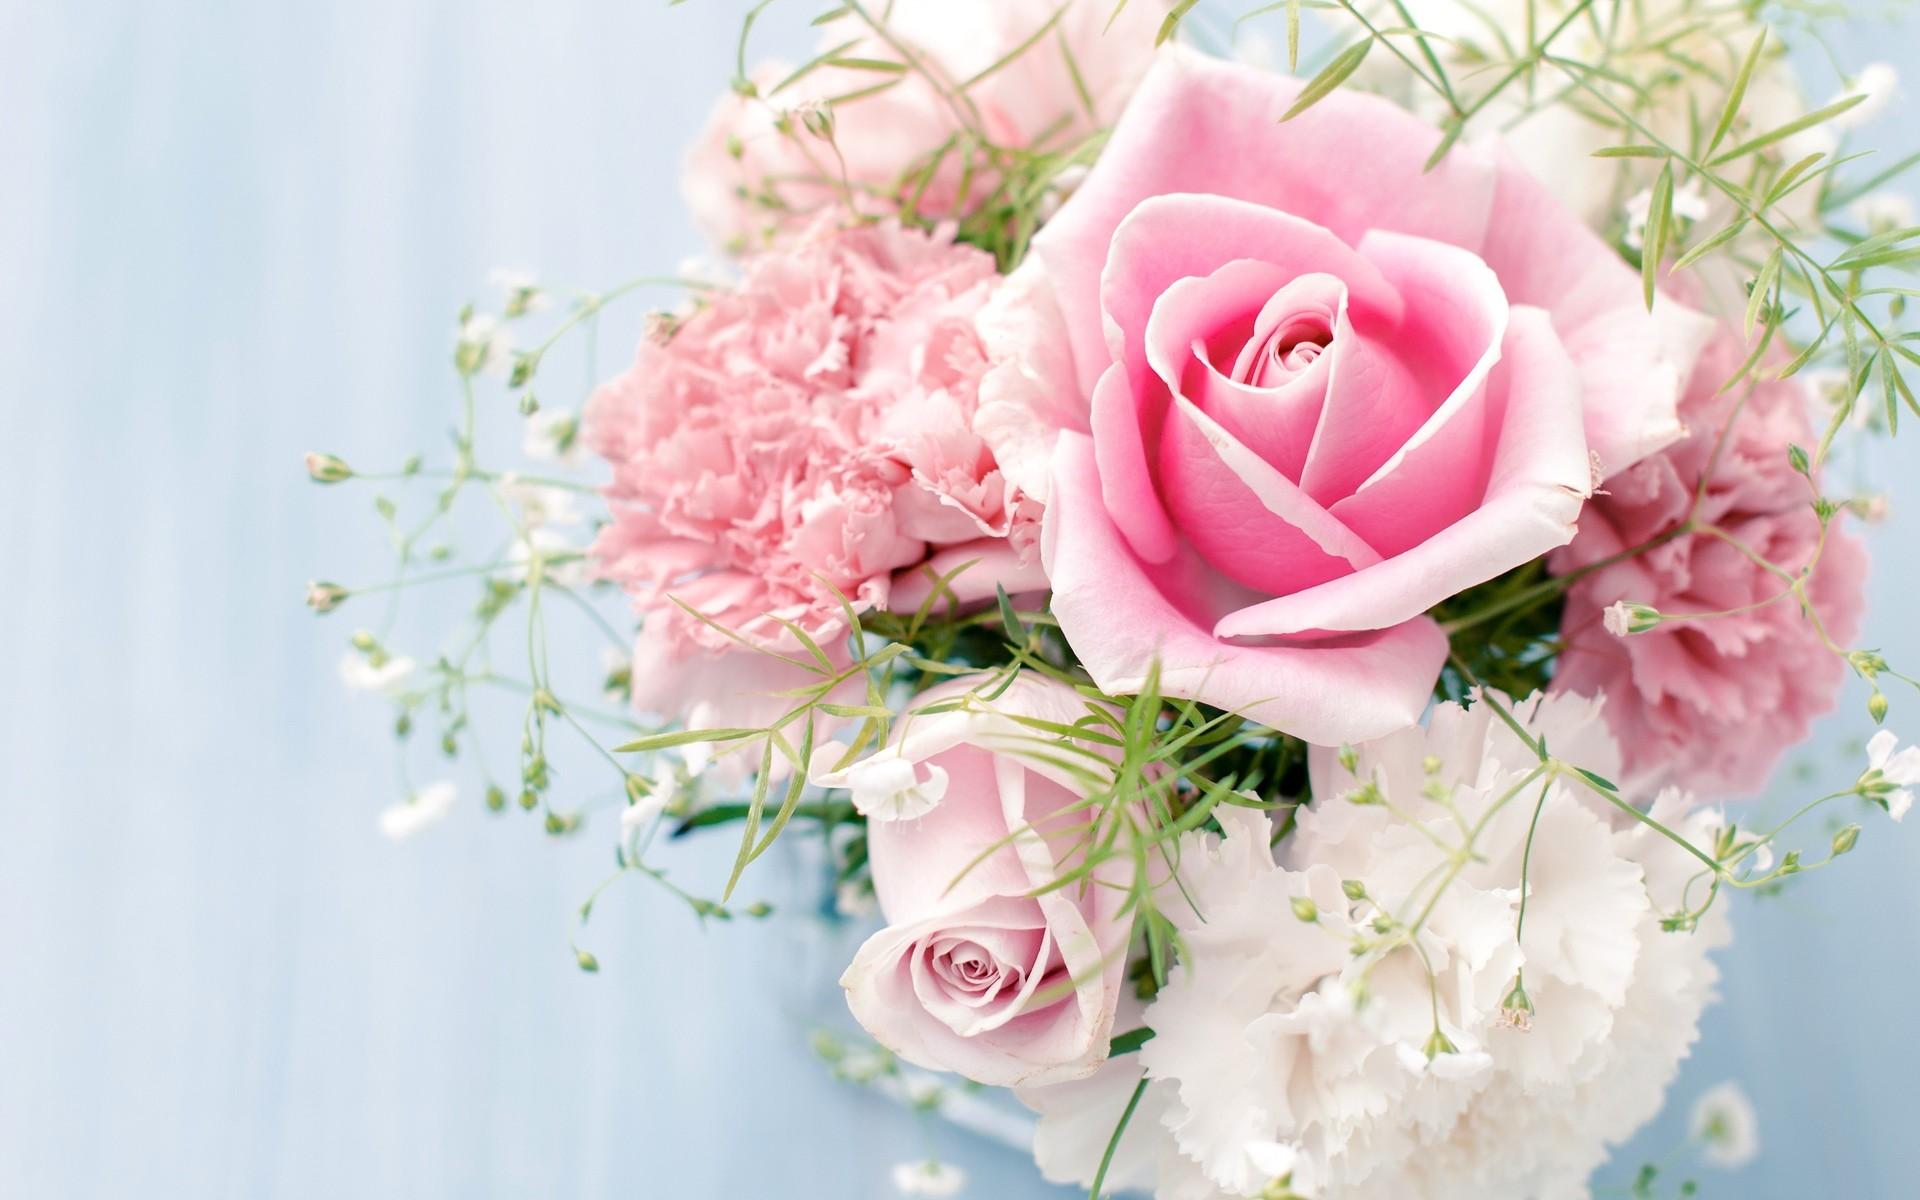 Res: 1920x1200, pink white rose wallpaper white and pink rose wallpaper 1